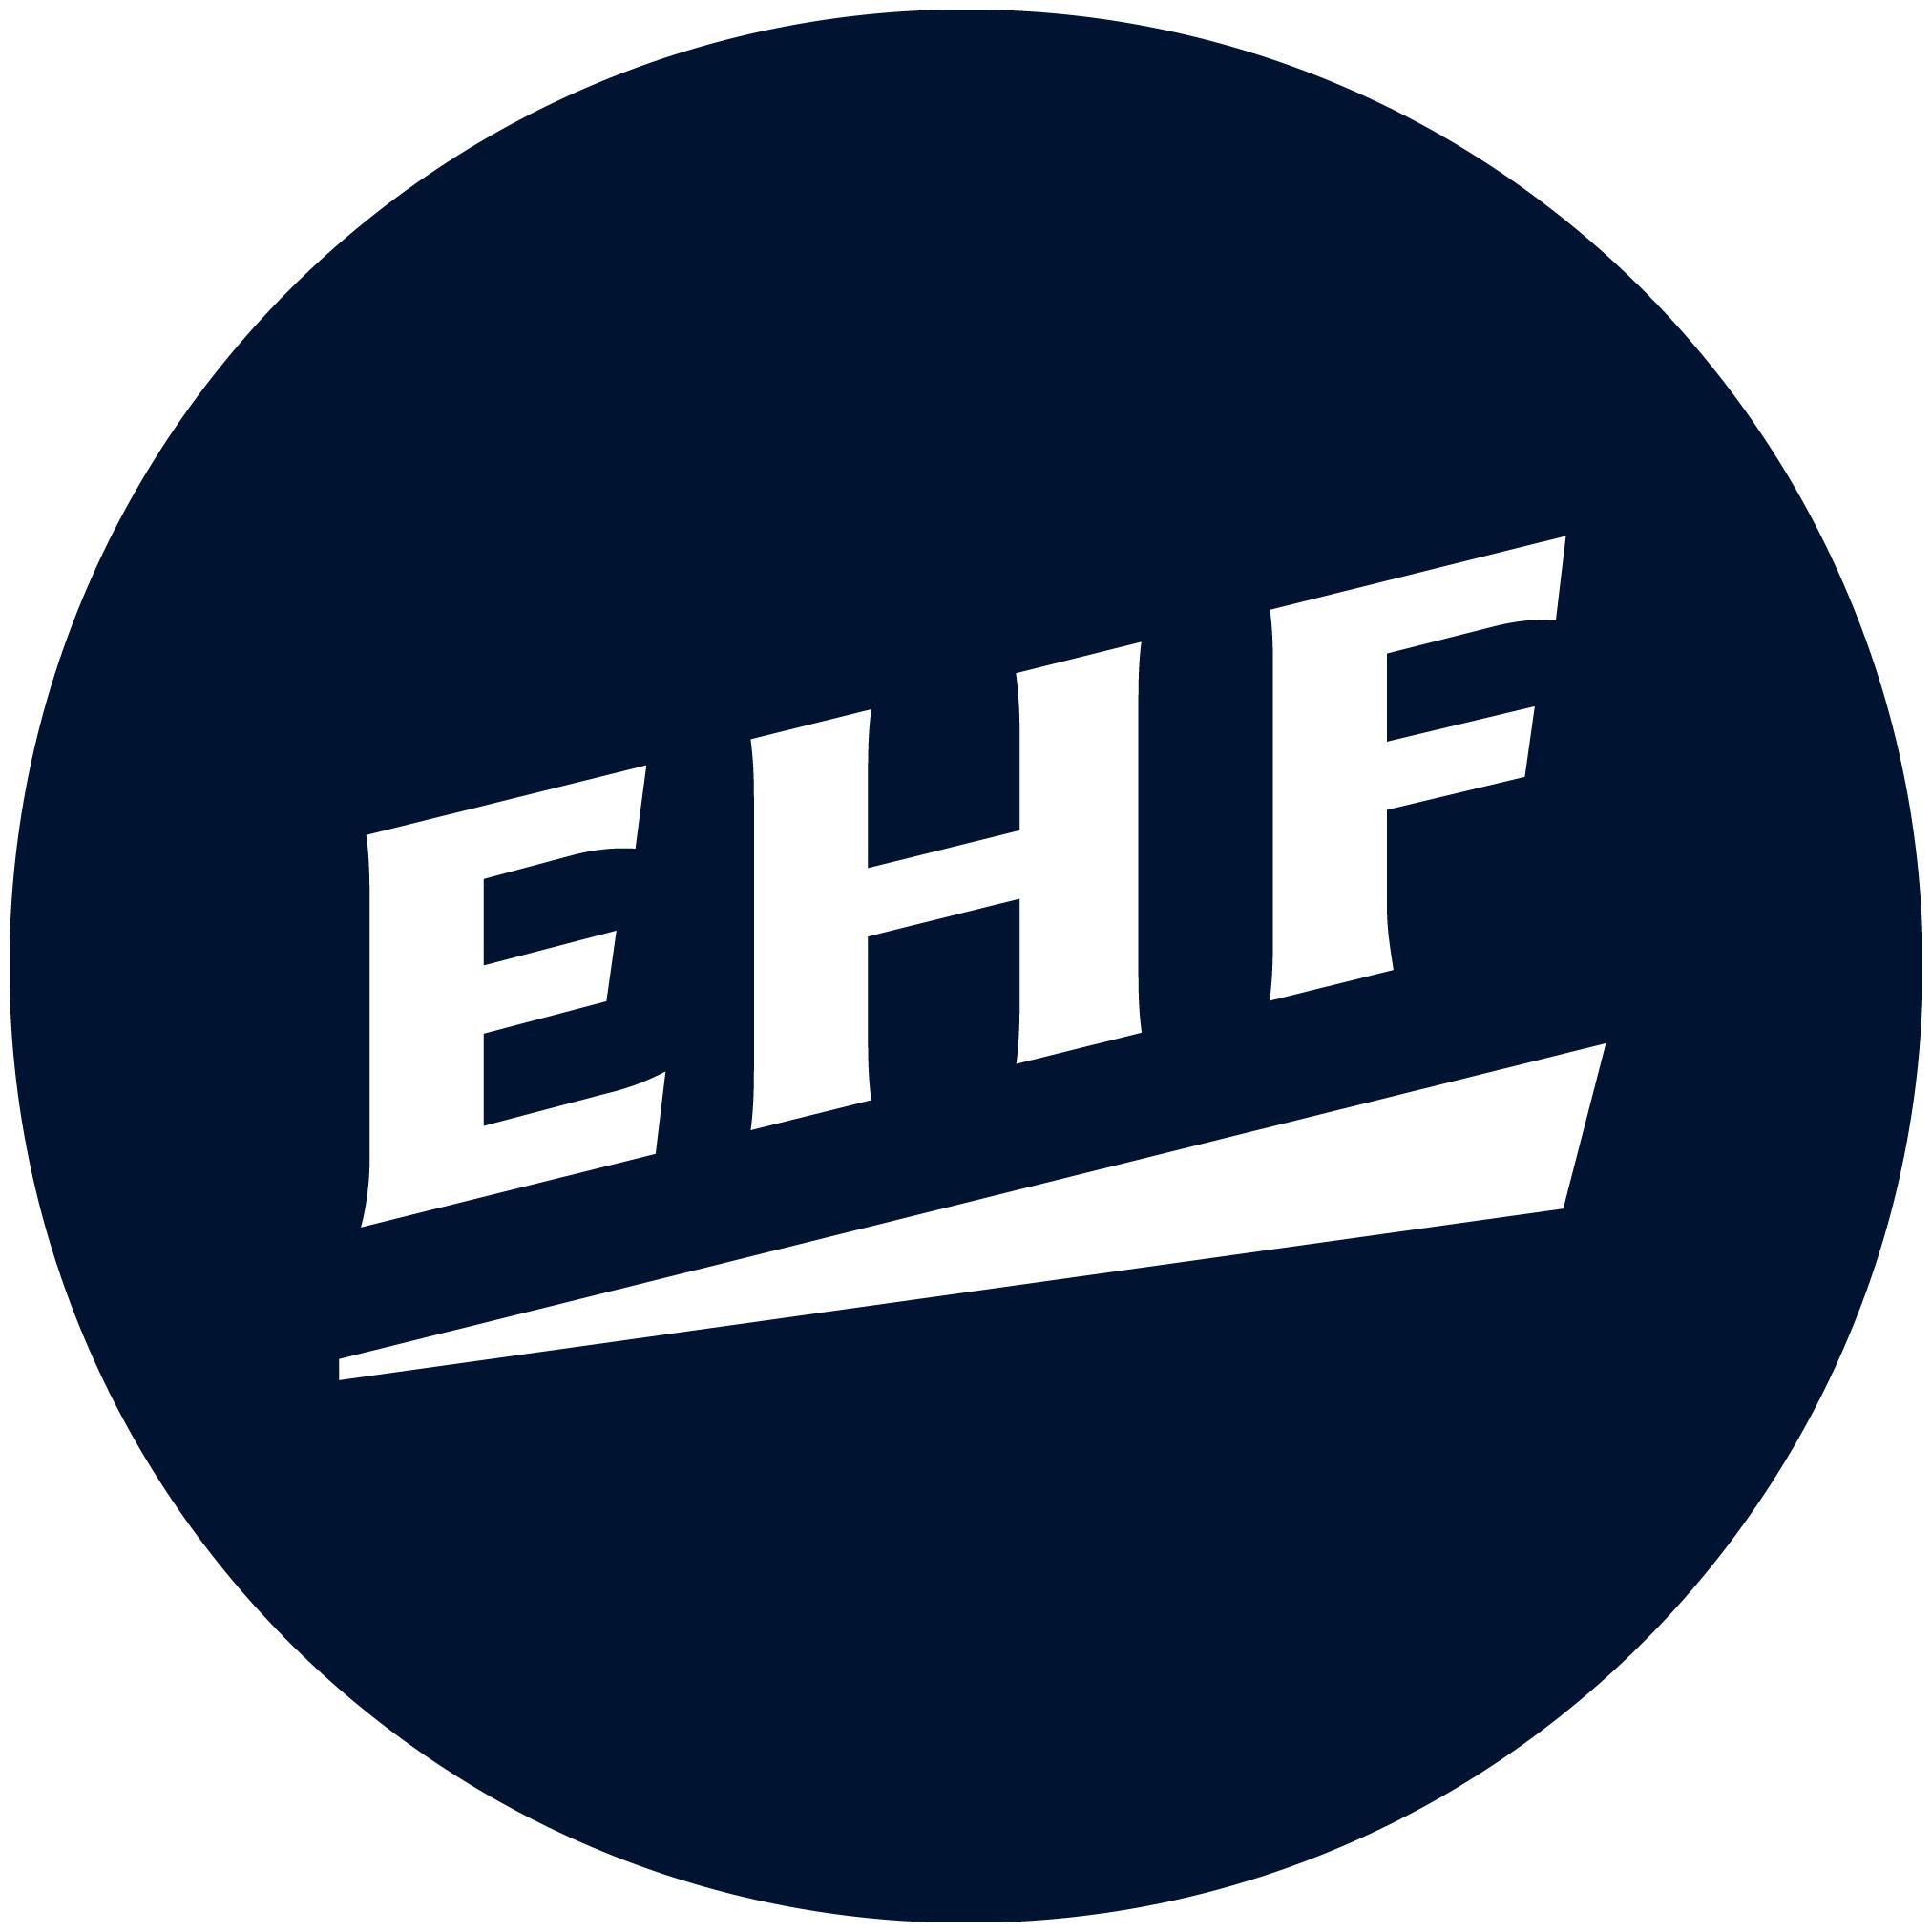 2021 European Handball Women's 19 EHF Championship